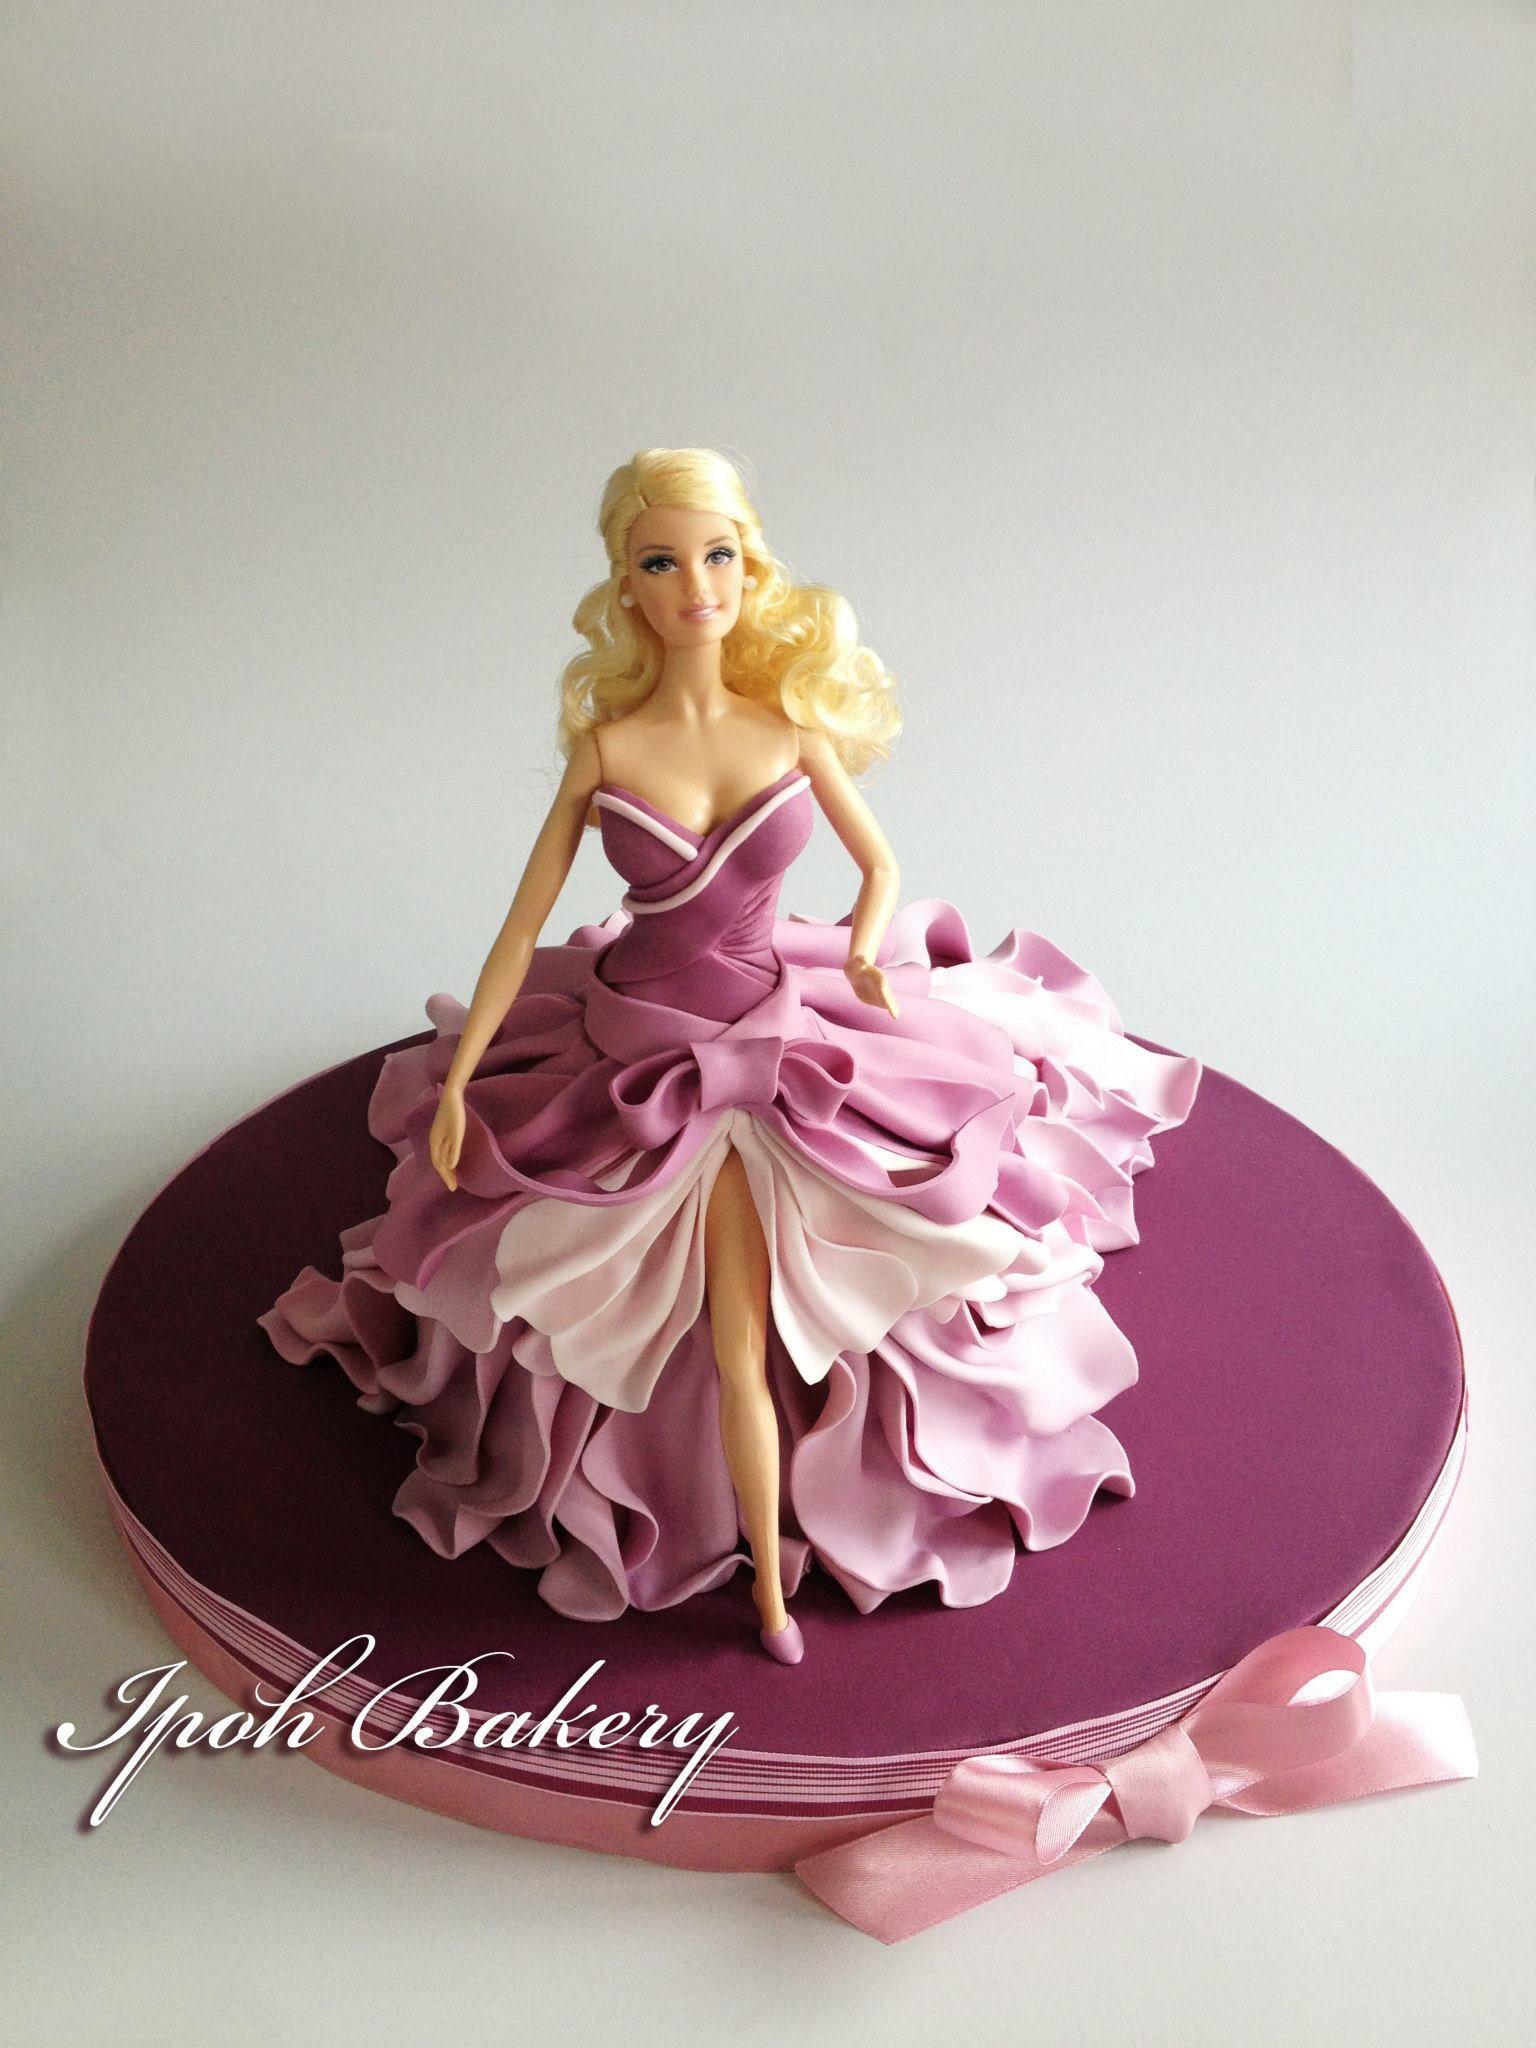 Barbie Fondant Cake Images : Barbie Doll Fondant Cake by Ipoh Bakery Just yummy pics ...